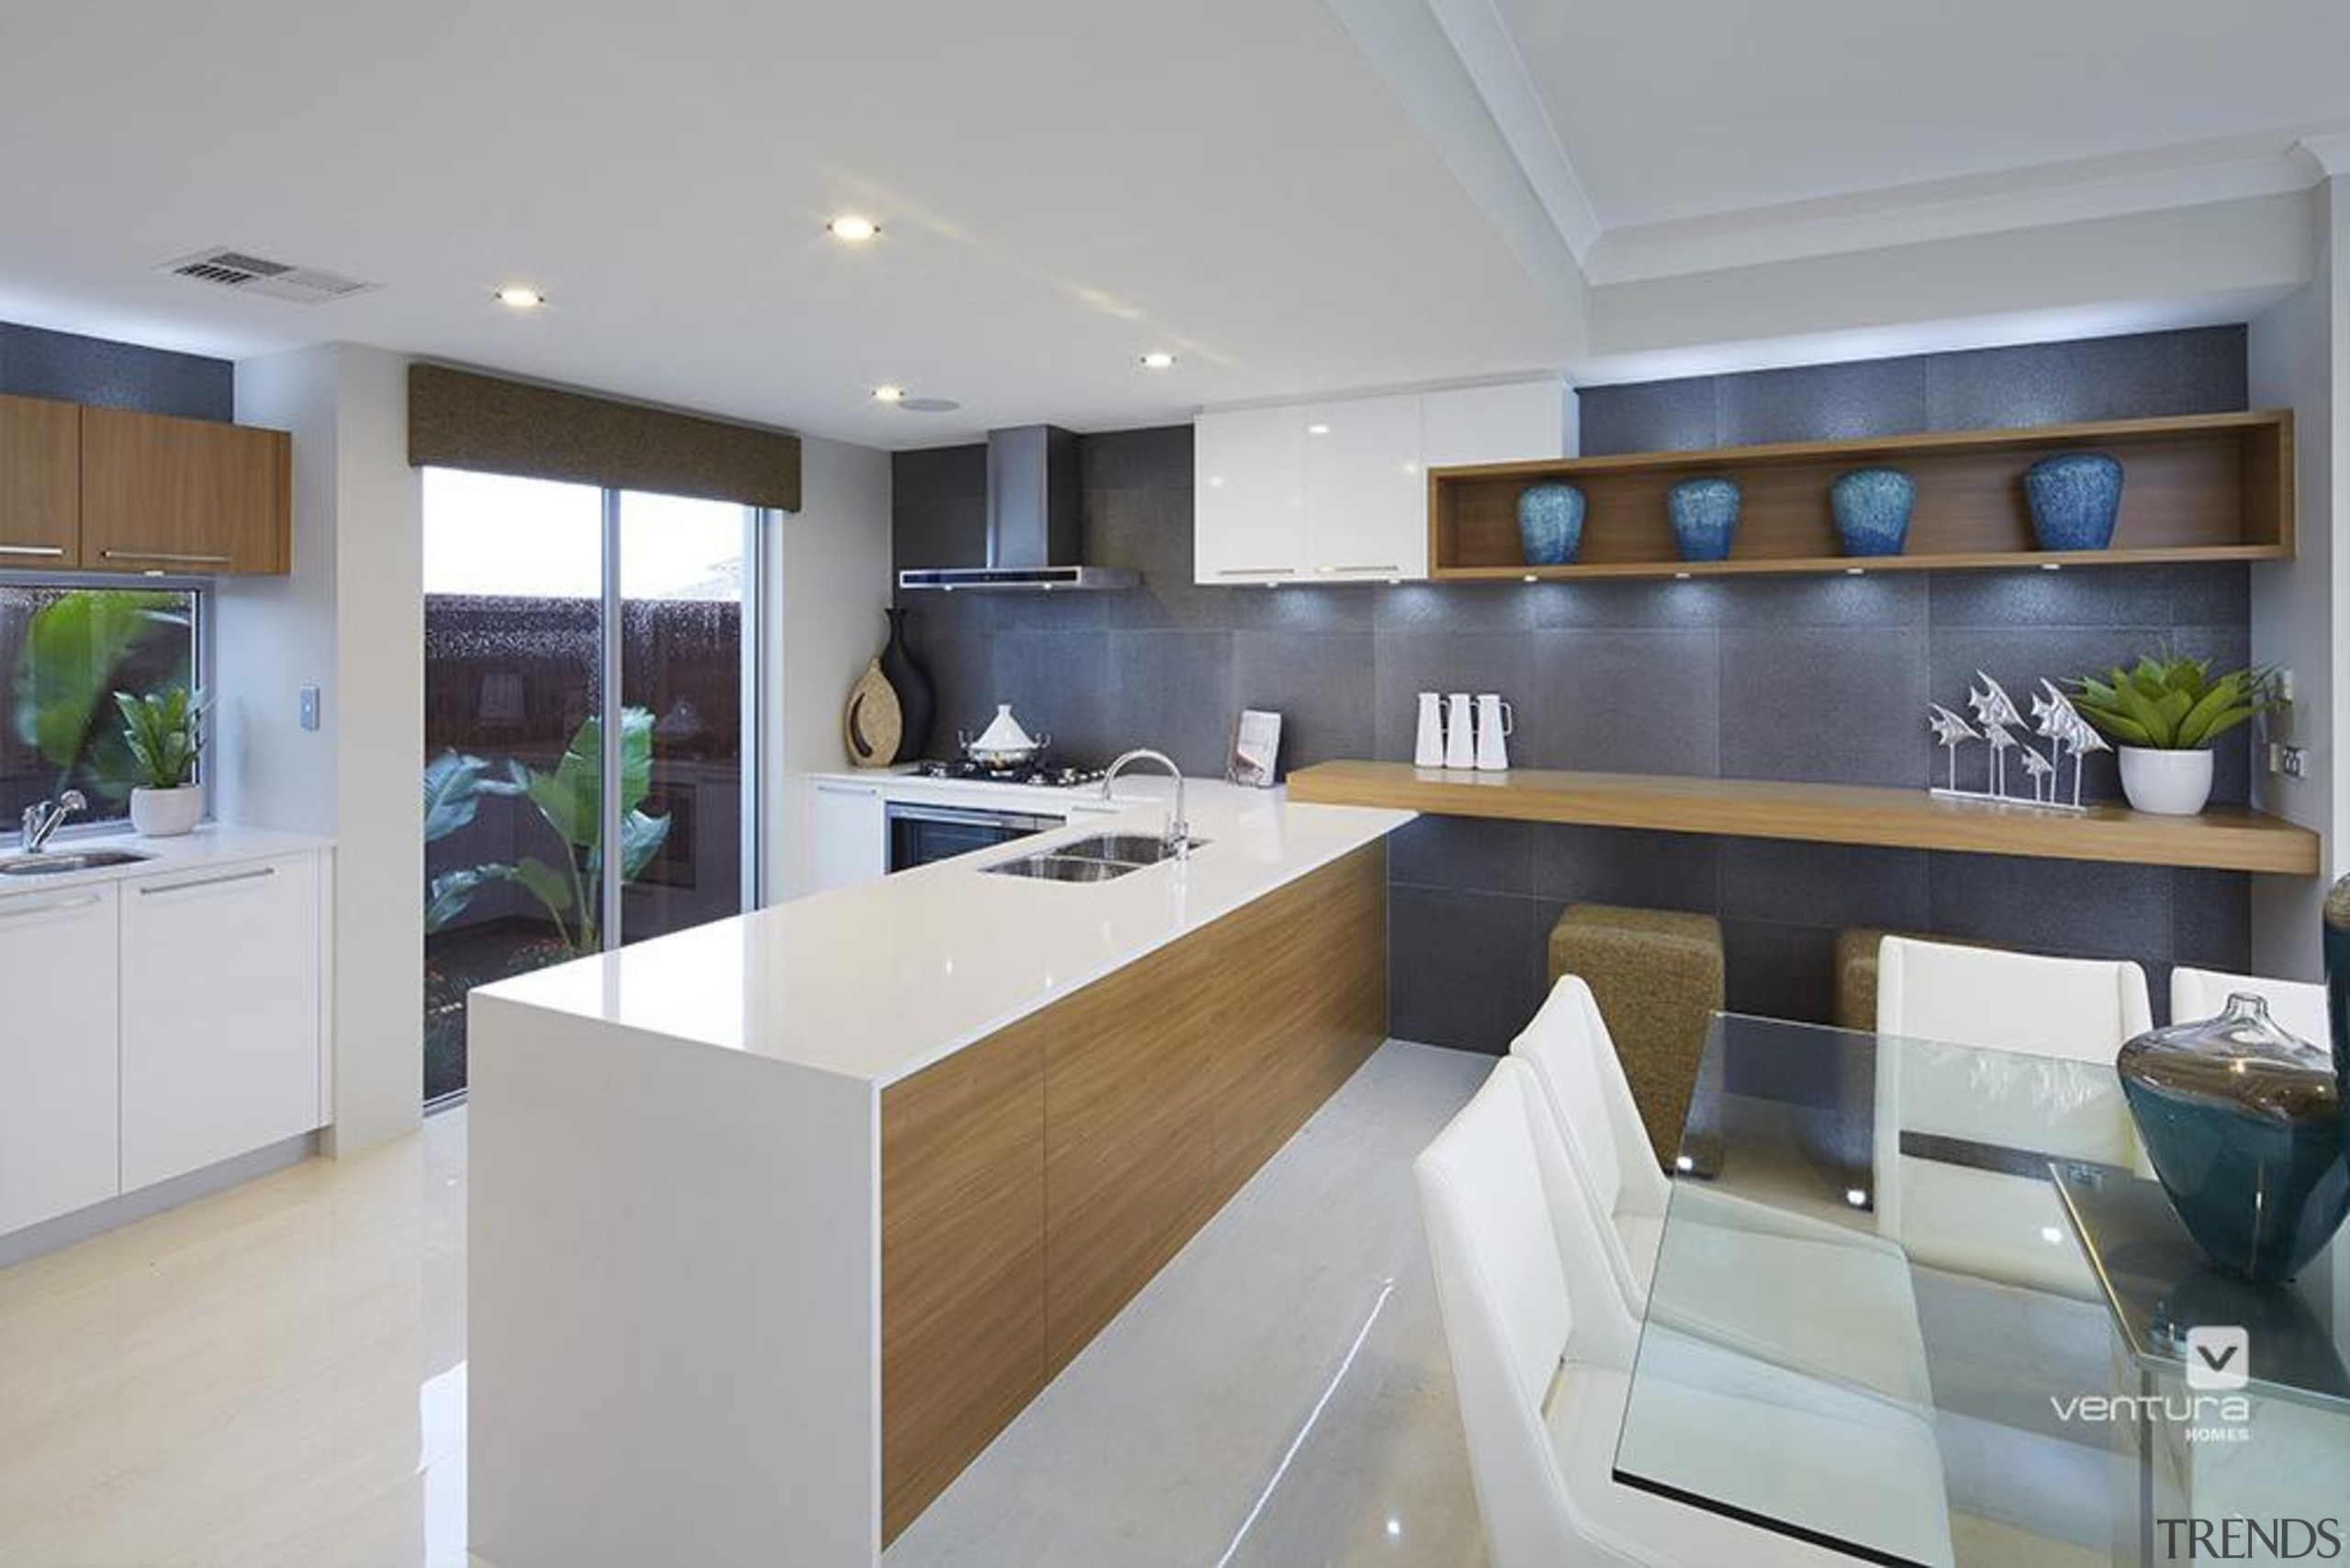 Kitchen design. - The Meridian Two Storey Display countertop, interior design, kitchen, real estate, gray